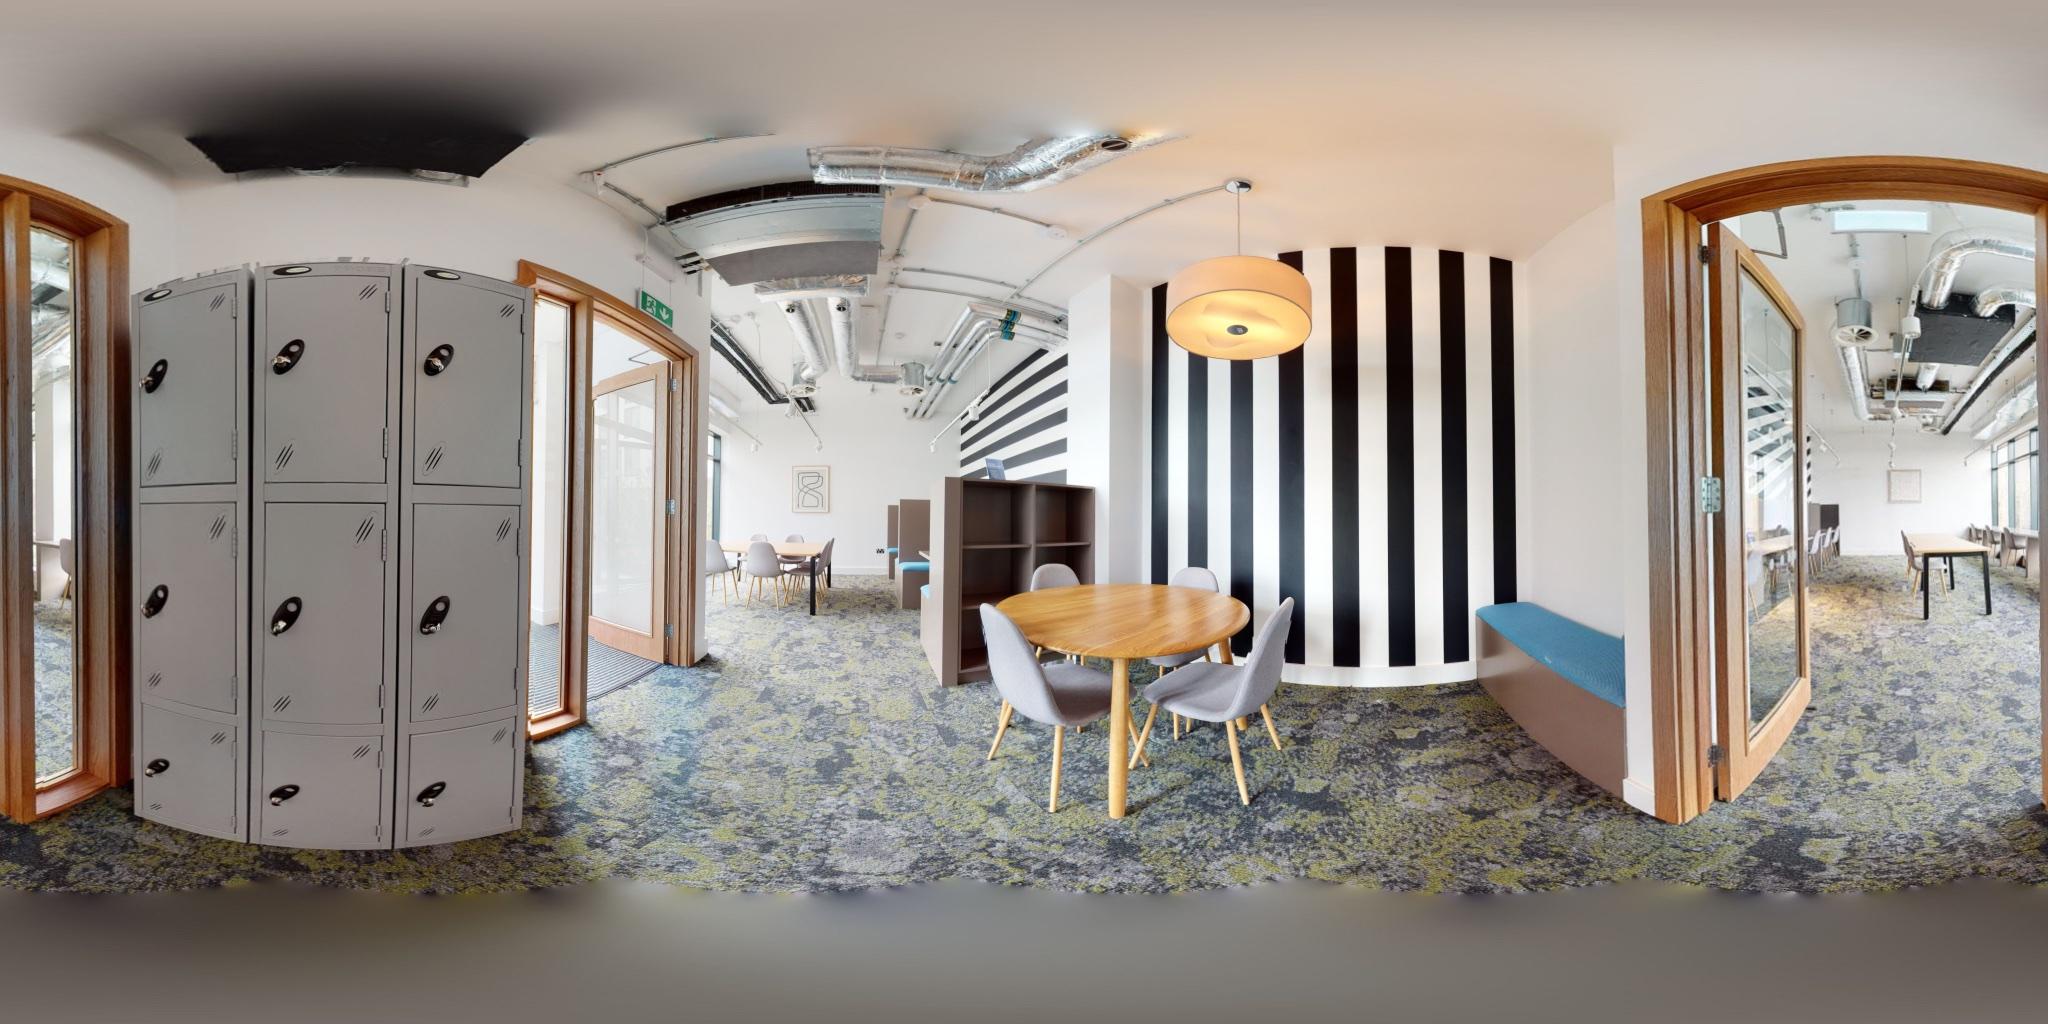 Student Accommodation 360° Matterport 3D Virtual Experiences